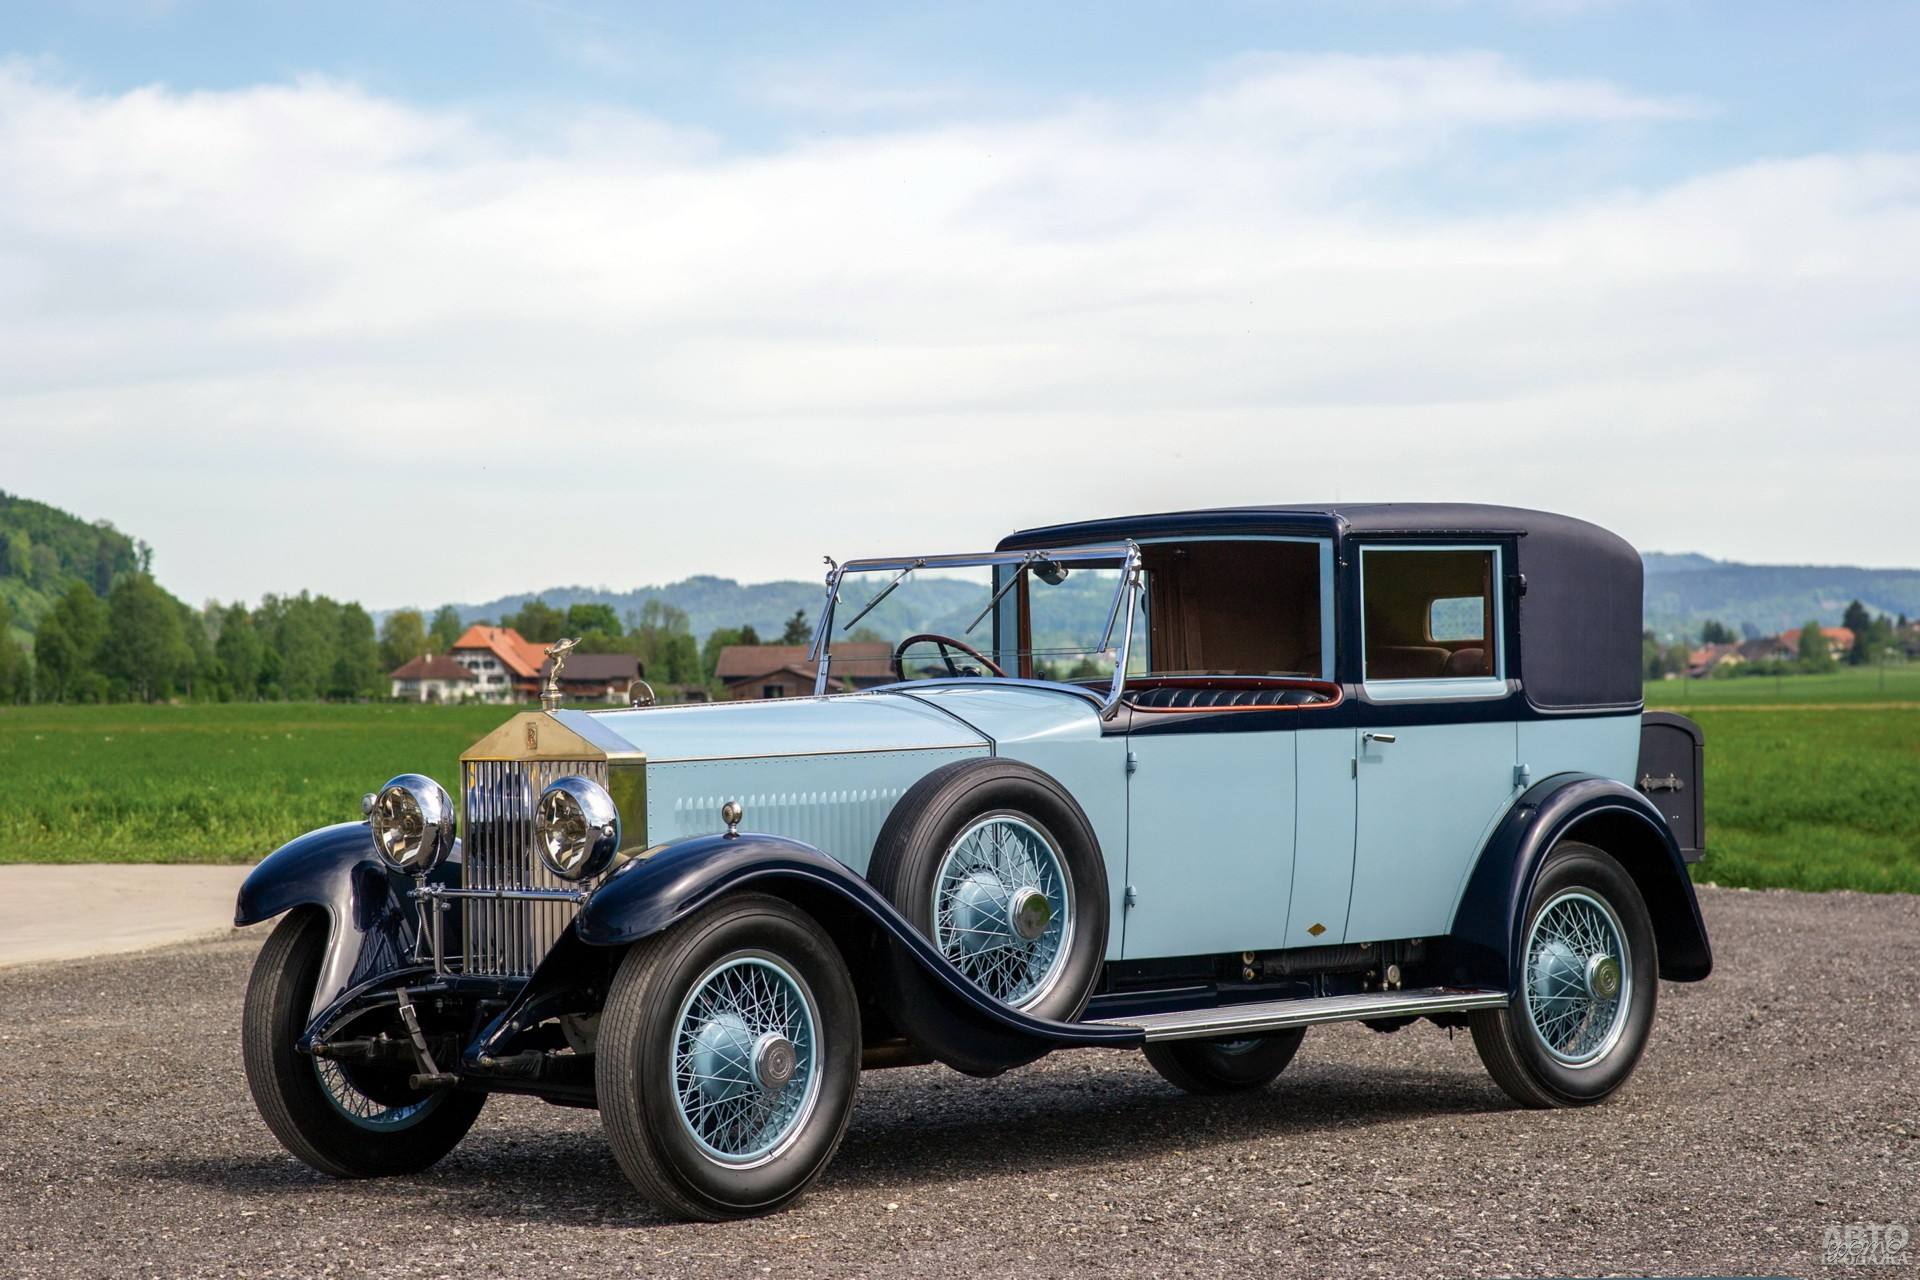 Усовершенствованный Rolls-Royce Silver Ghost 1920 года